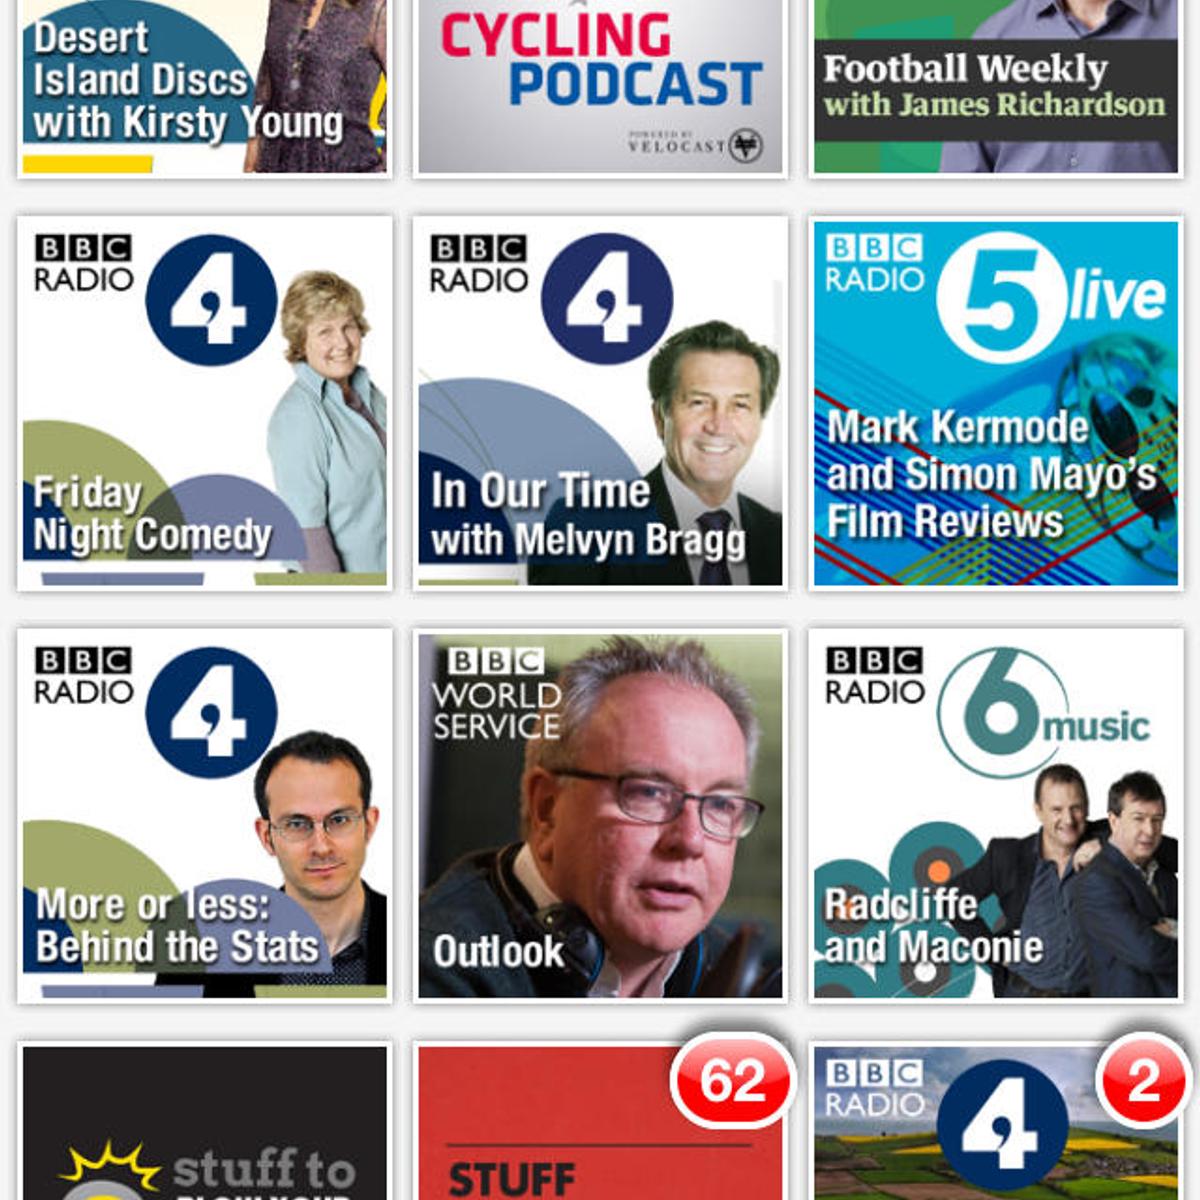 RSSRadio Podcast Downloader Alternatives and Similar Apps